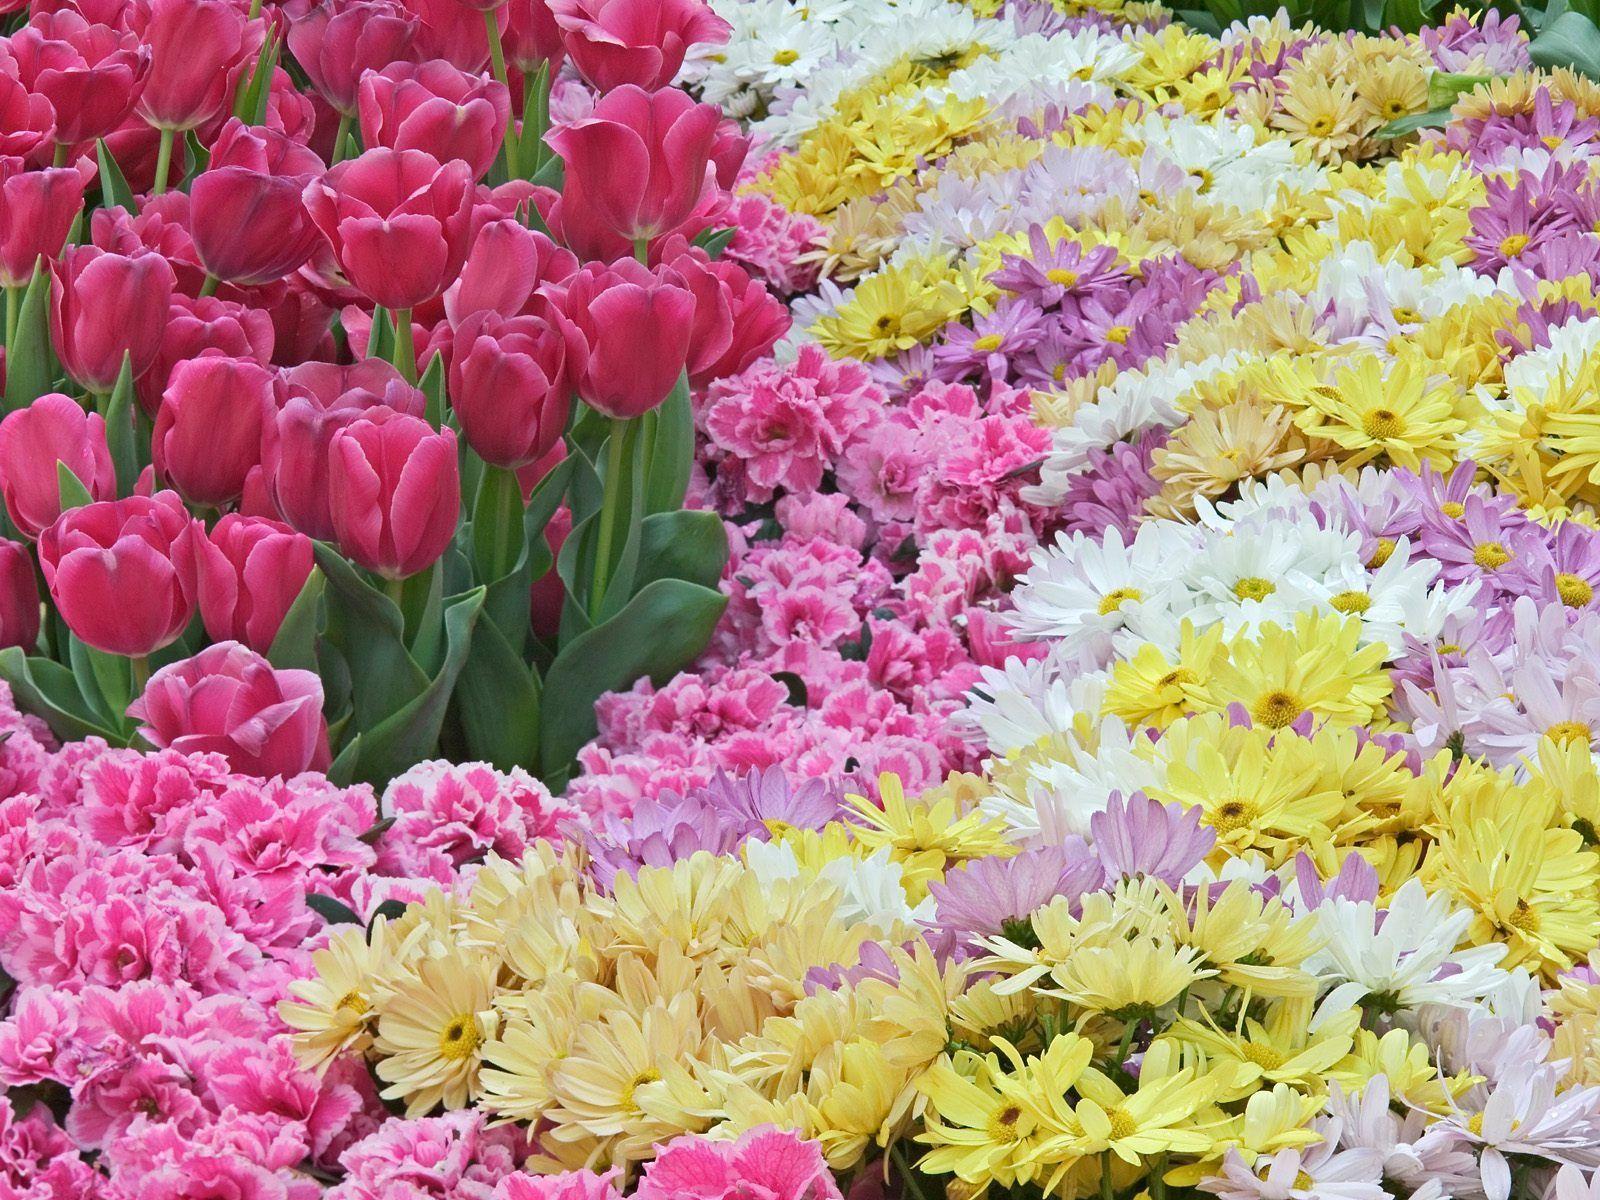 Natural Pastels Wallpaper Flowers Nature Wallpapers - Natural Flower Wallpaper Free Download - HD Wallpaper